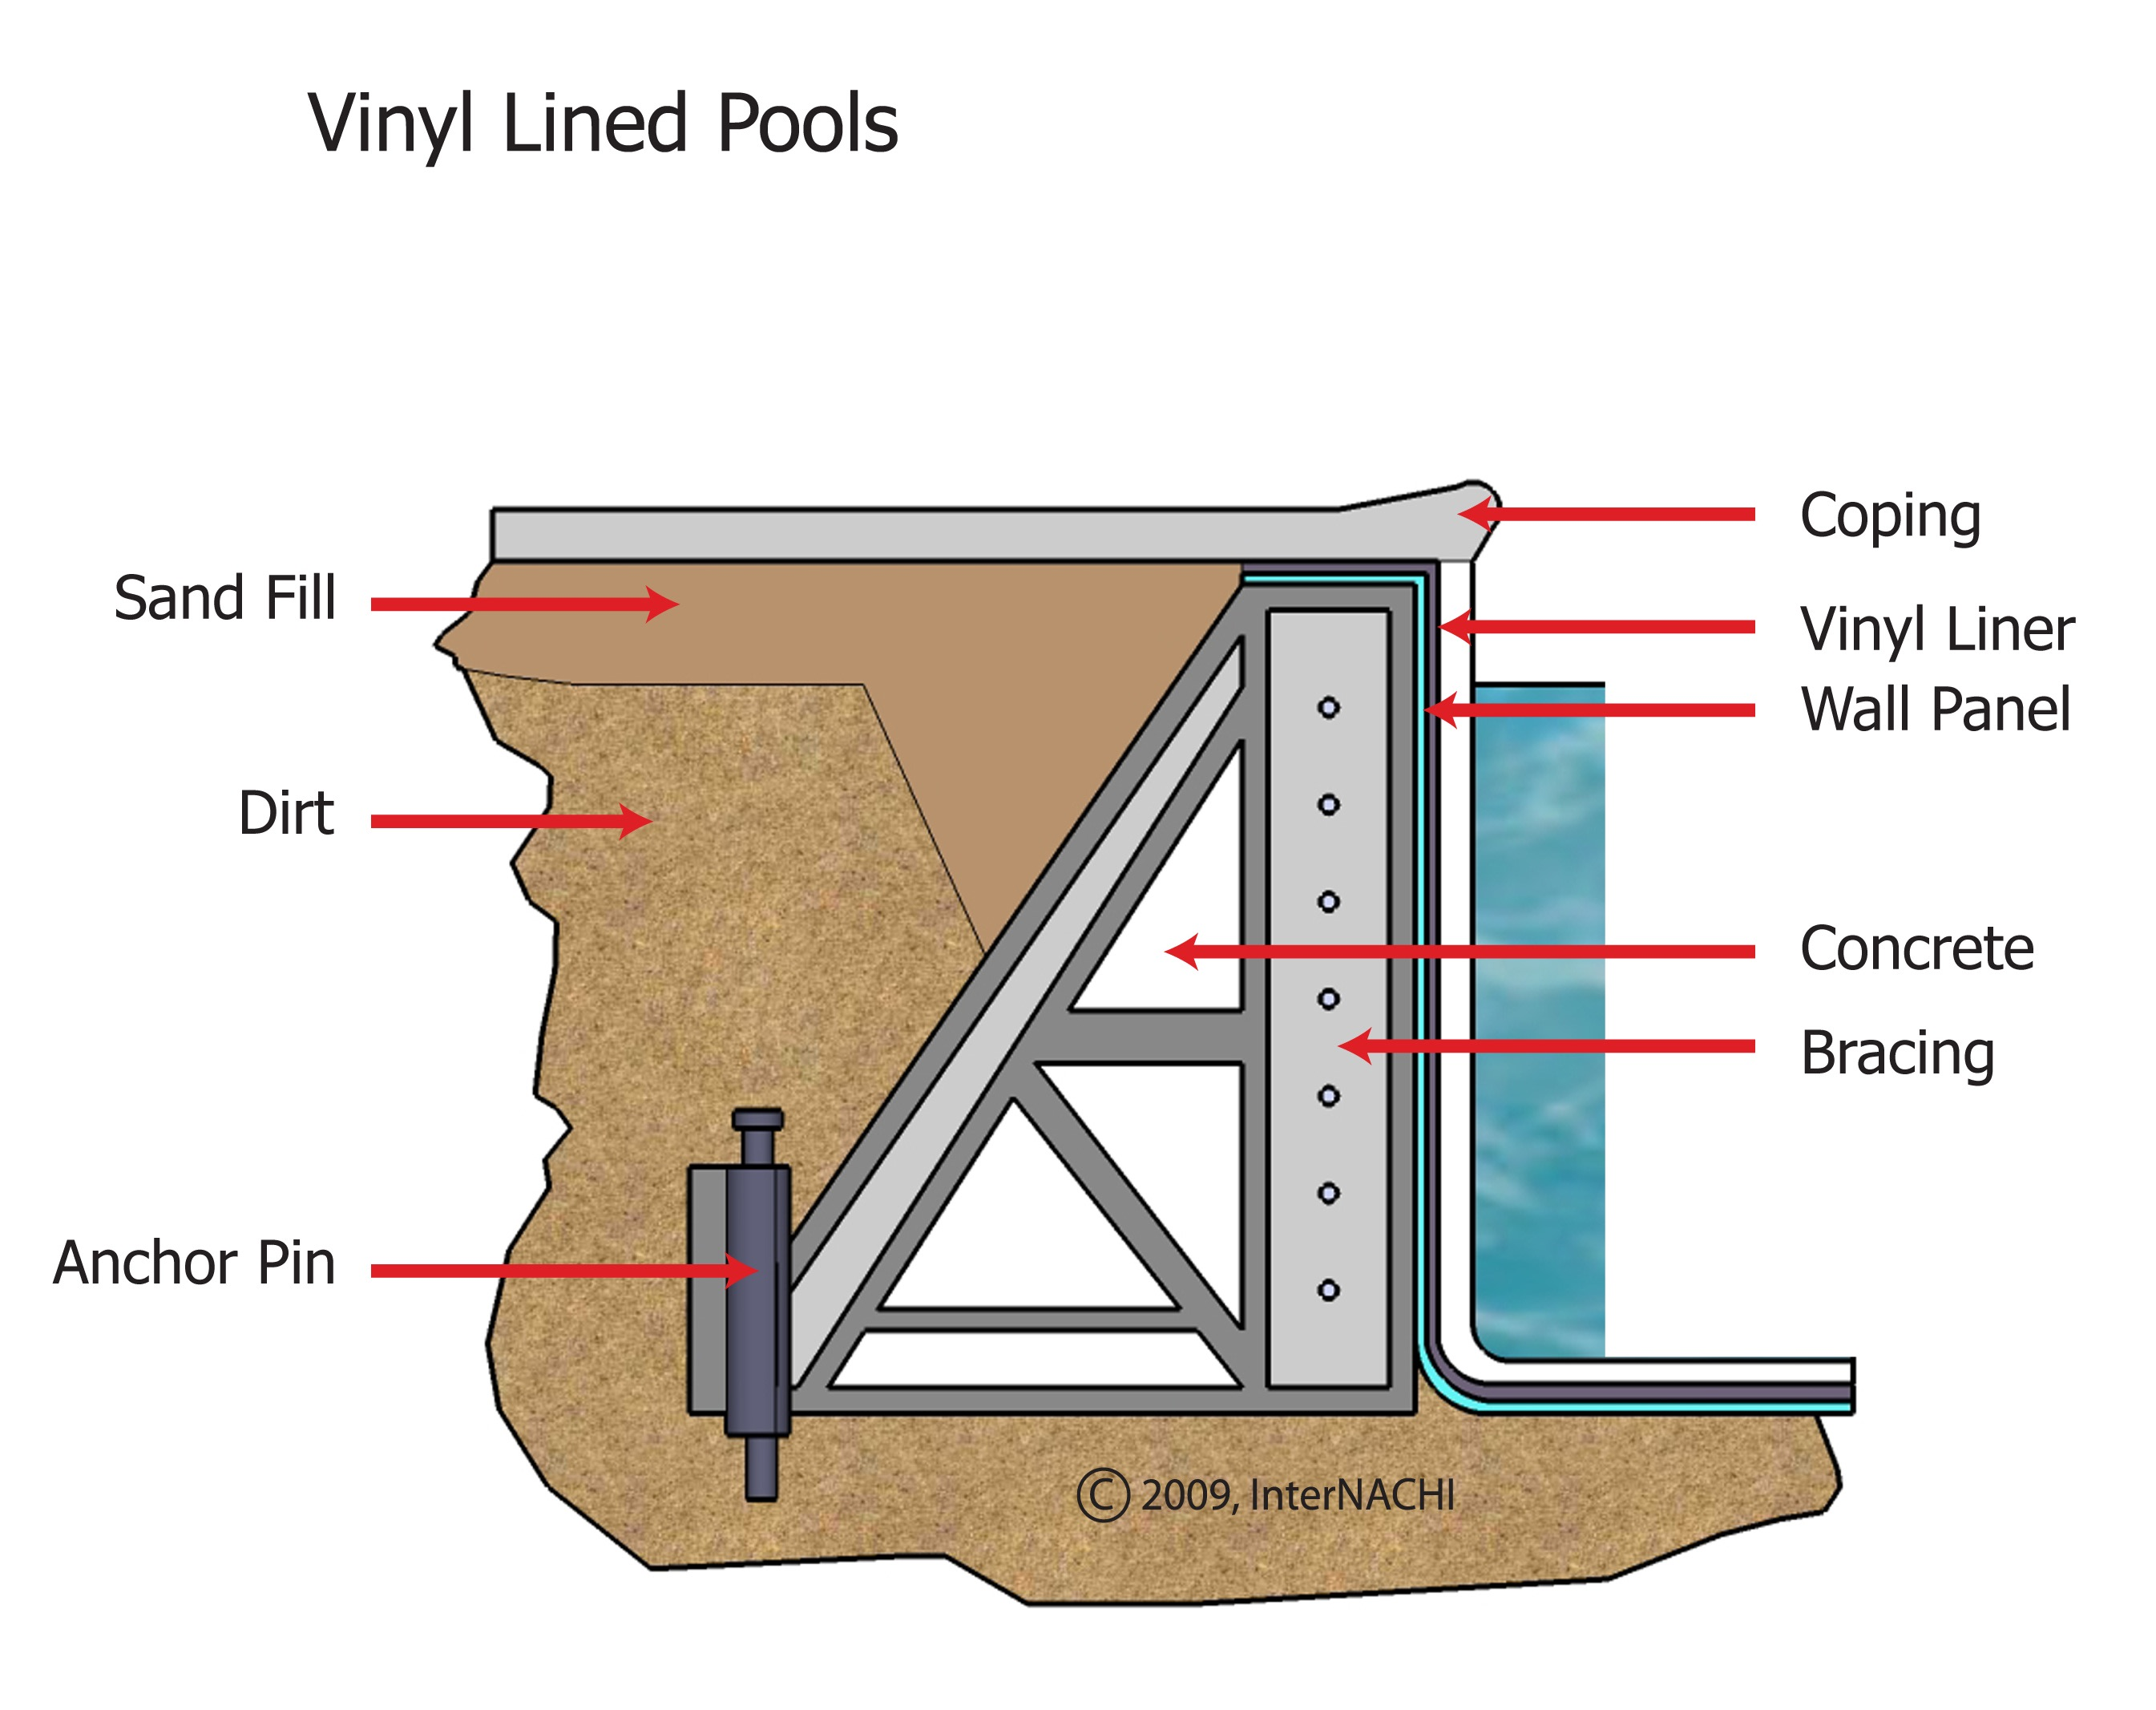 Vinyl-lined pool.